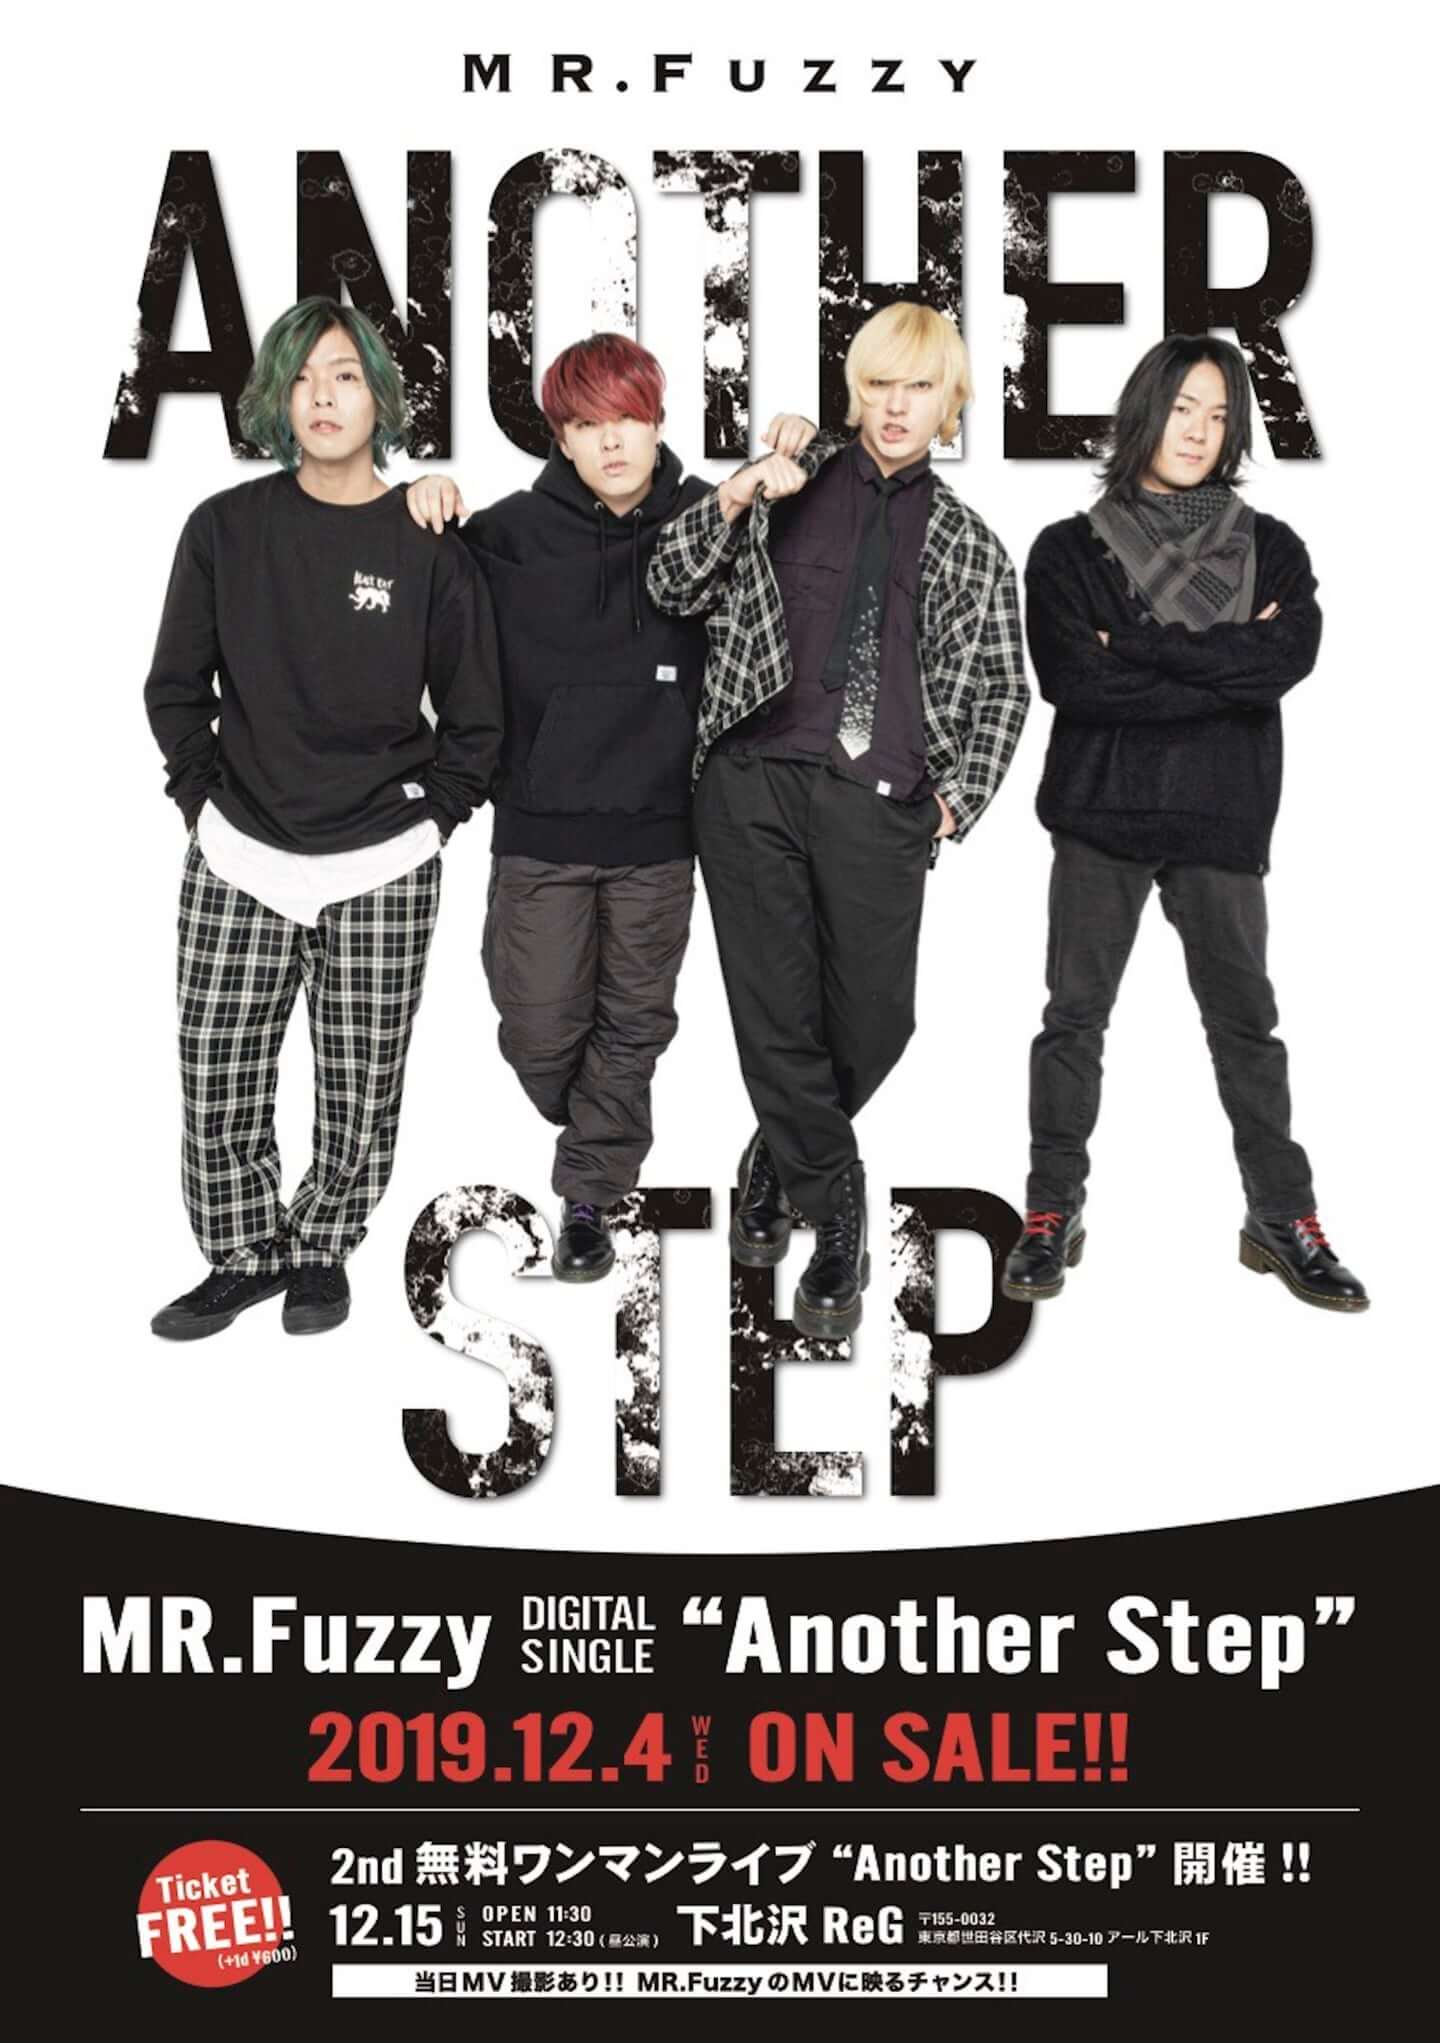 "MR.Fuzzyが一歩を踏み出す決意を込めた楽曲""Another Step""をデジタルリリース!下北沢で無料ライブも開催 music191209_mrfuzzy_01-1440x2043"